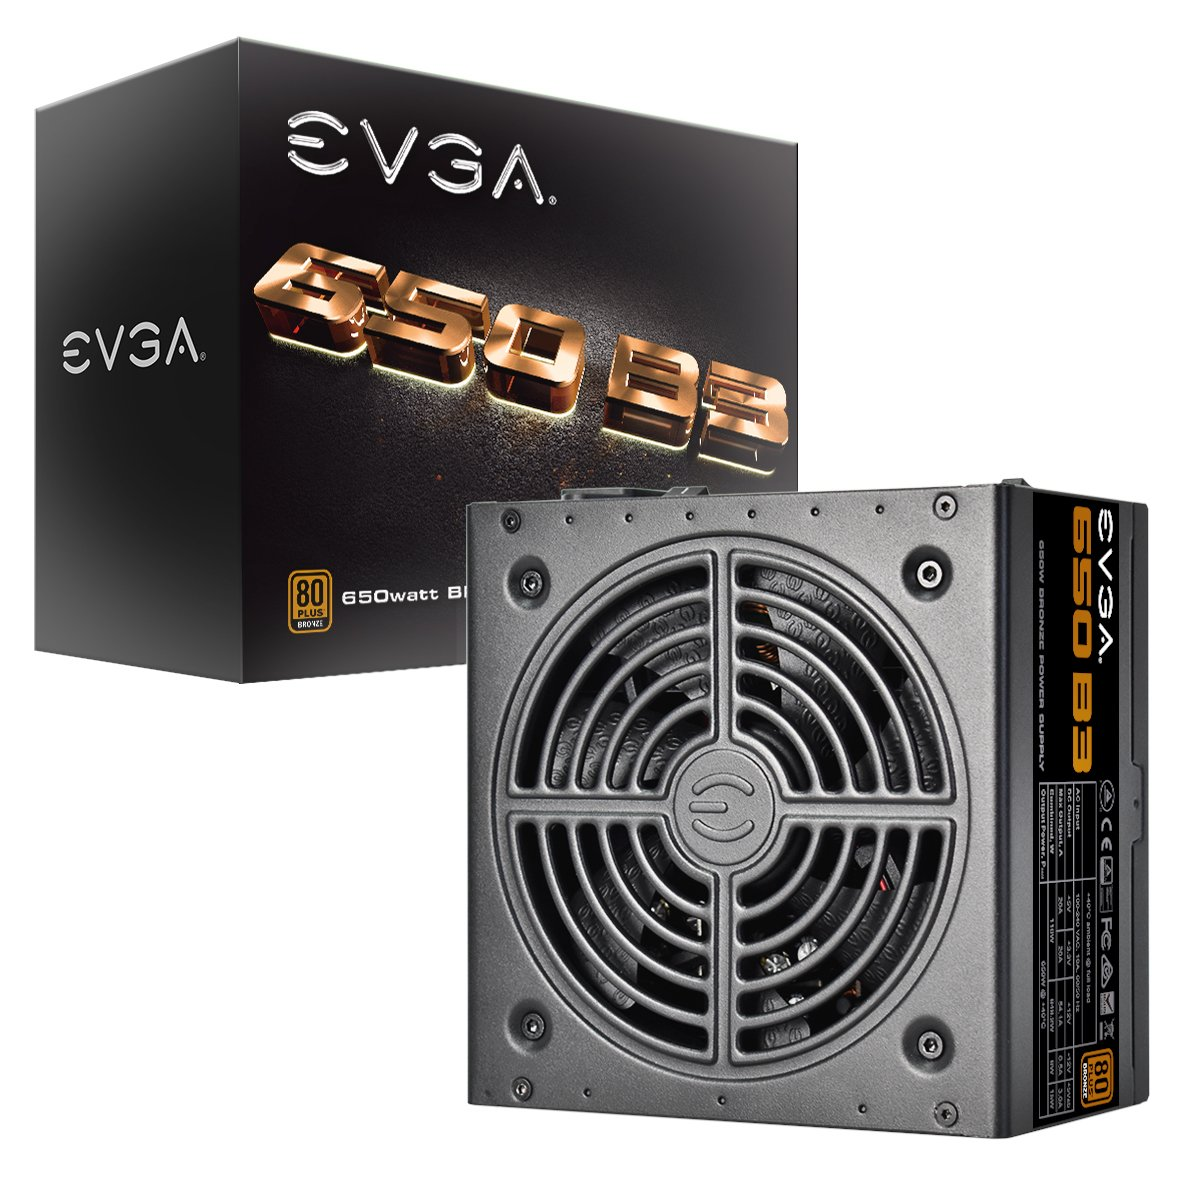 EVGA 650 B3, 80+ BRONZE 650W, Fully Modular, EVGA ECO Mode, 5 Year Warranty, Compact 150mm Size, Power Supply 220-B3-0650-V1